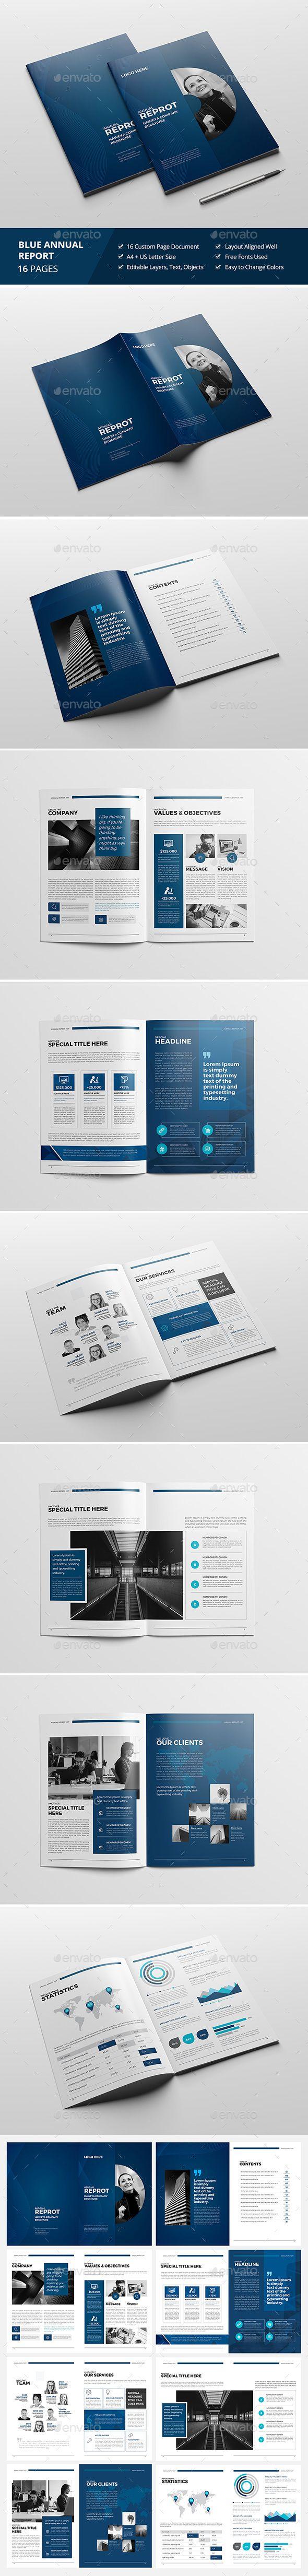 Haweya Blue Report/Brochure   Indesign templates, Brochures and ...